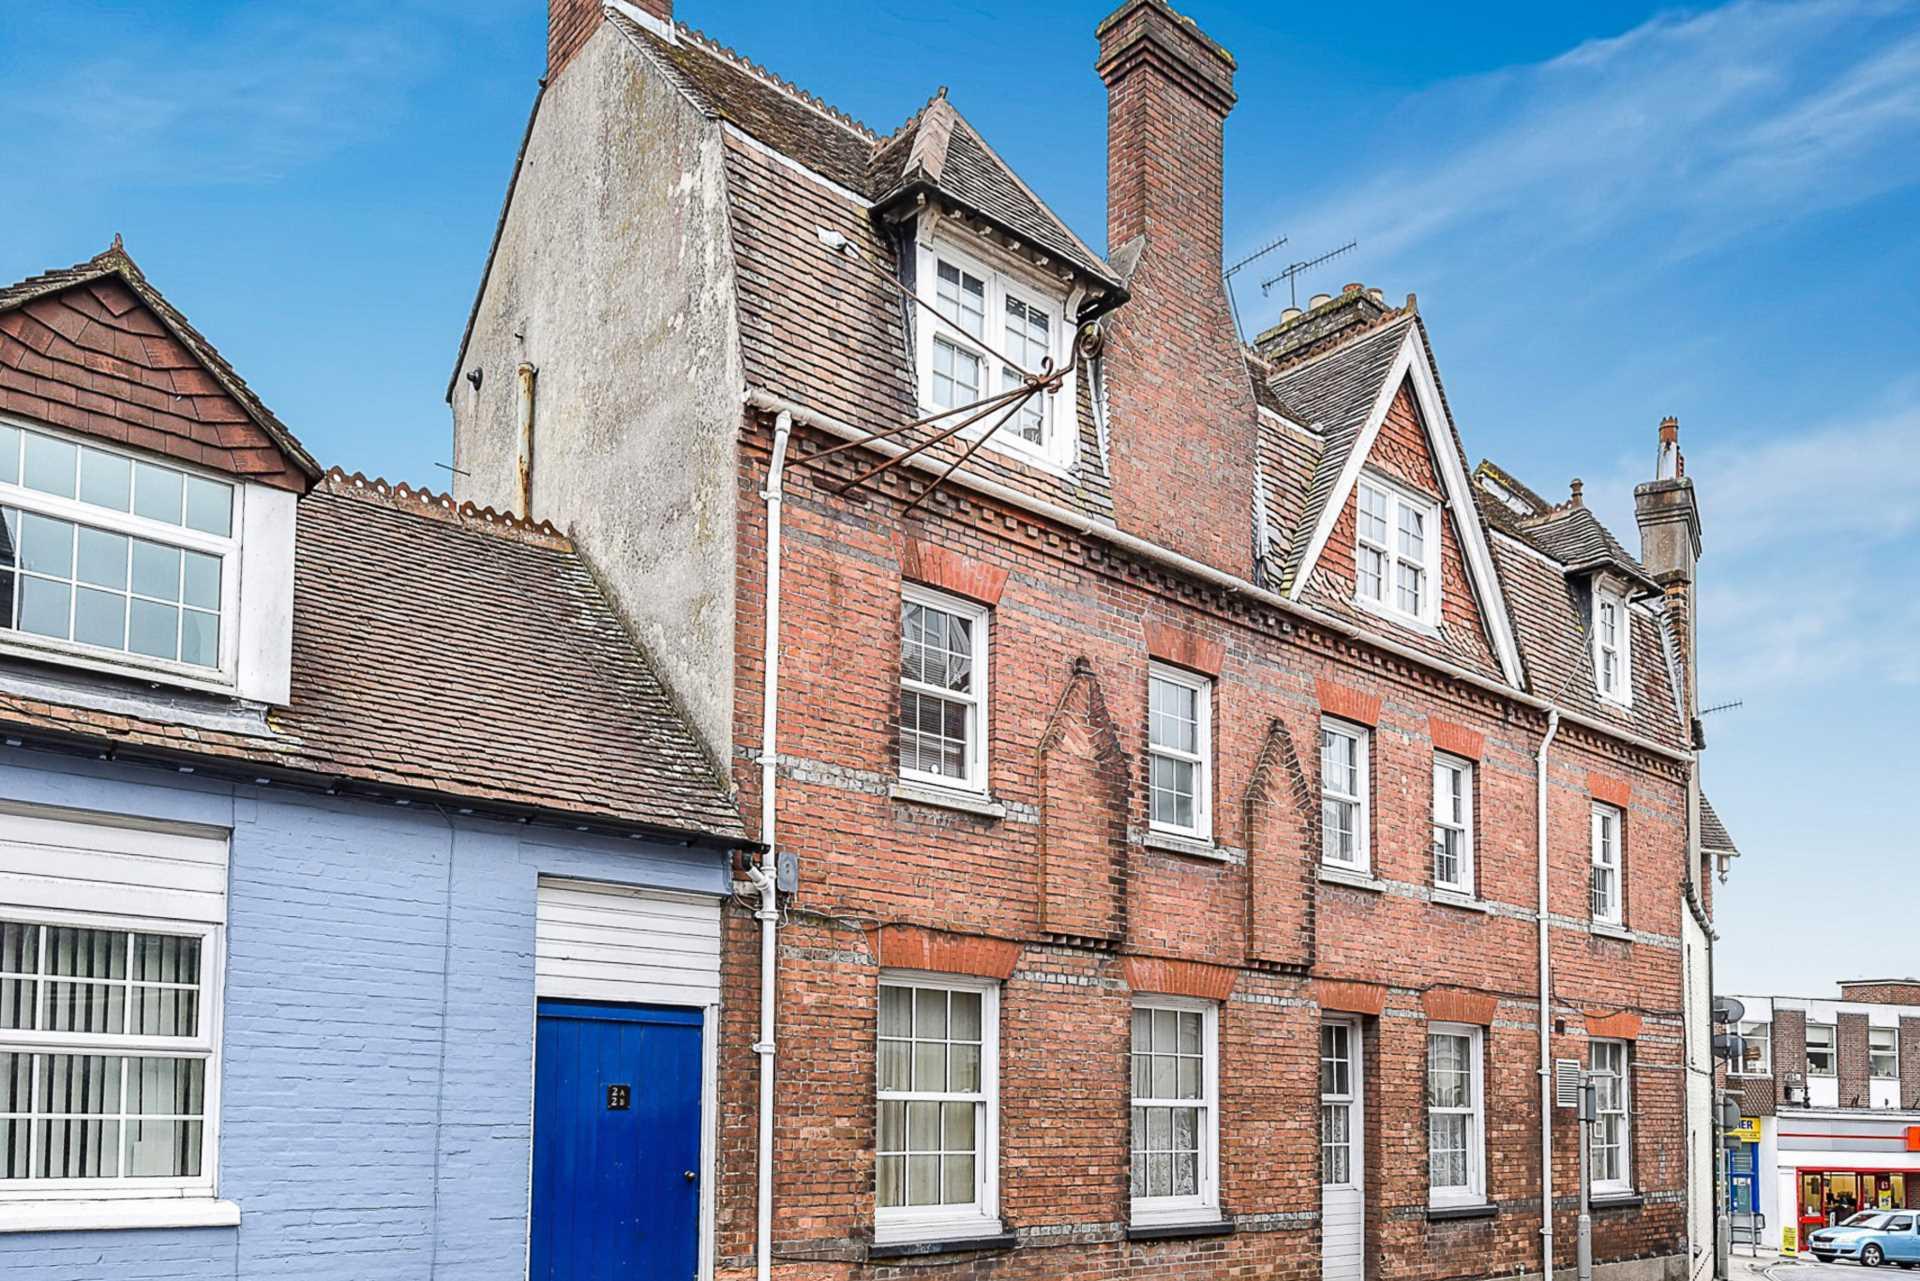 2 bed flat for sale in Salisbury Street, Blandford Forum 0